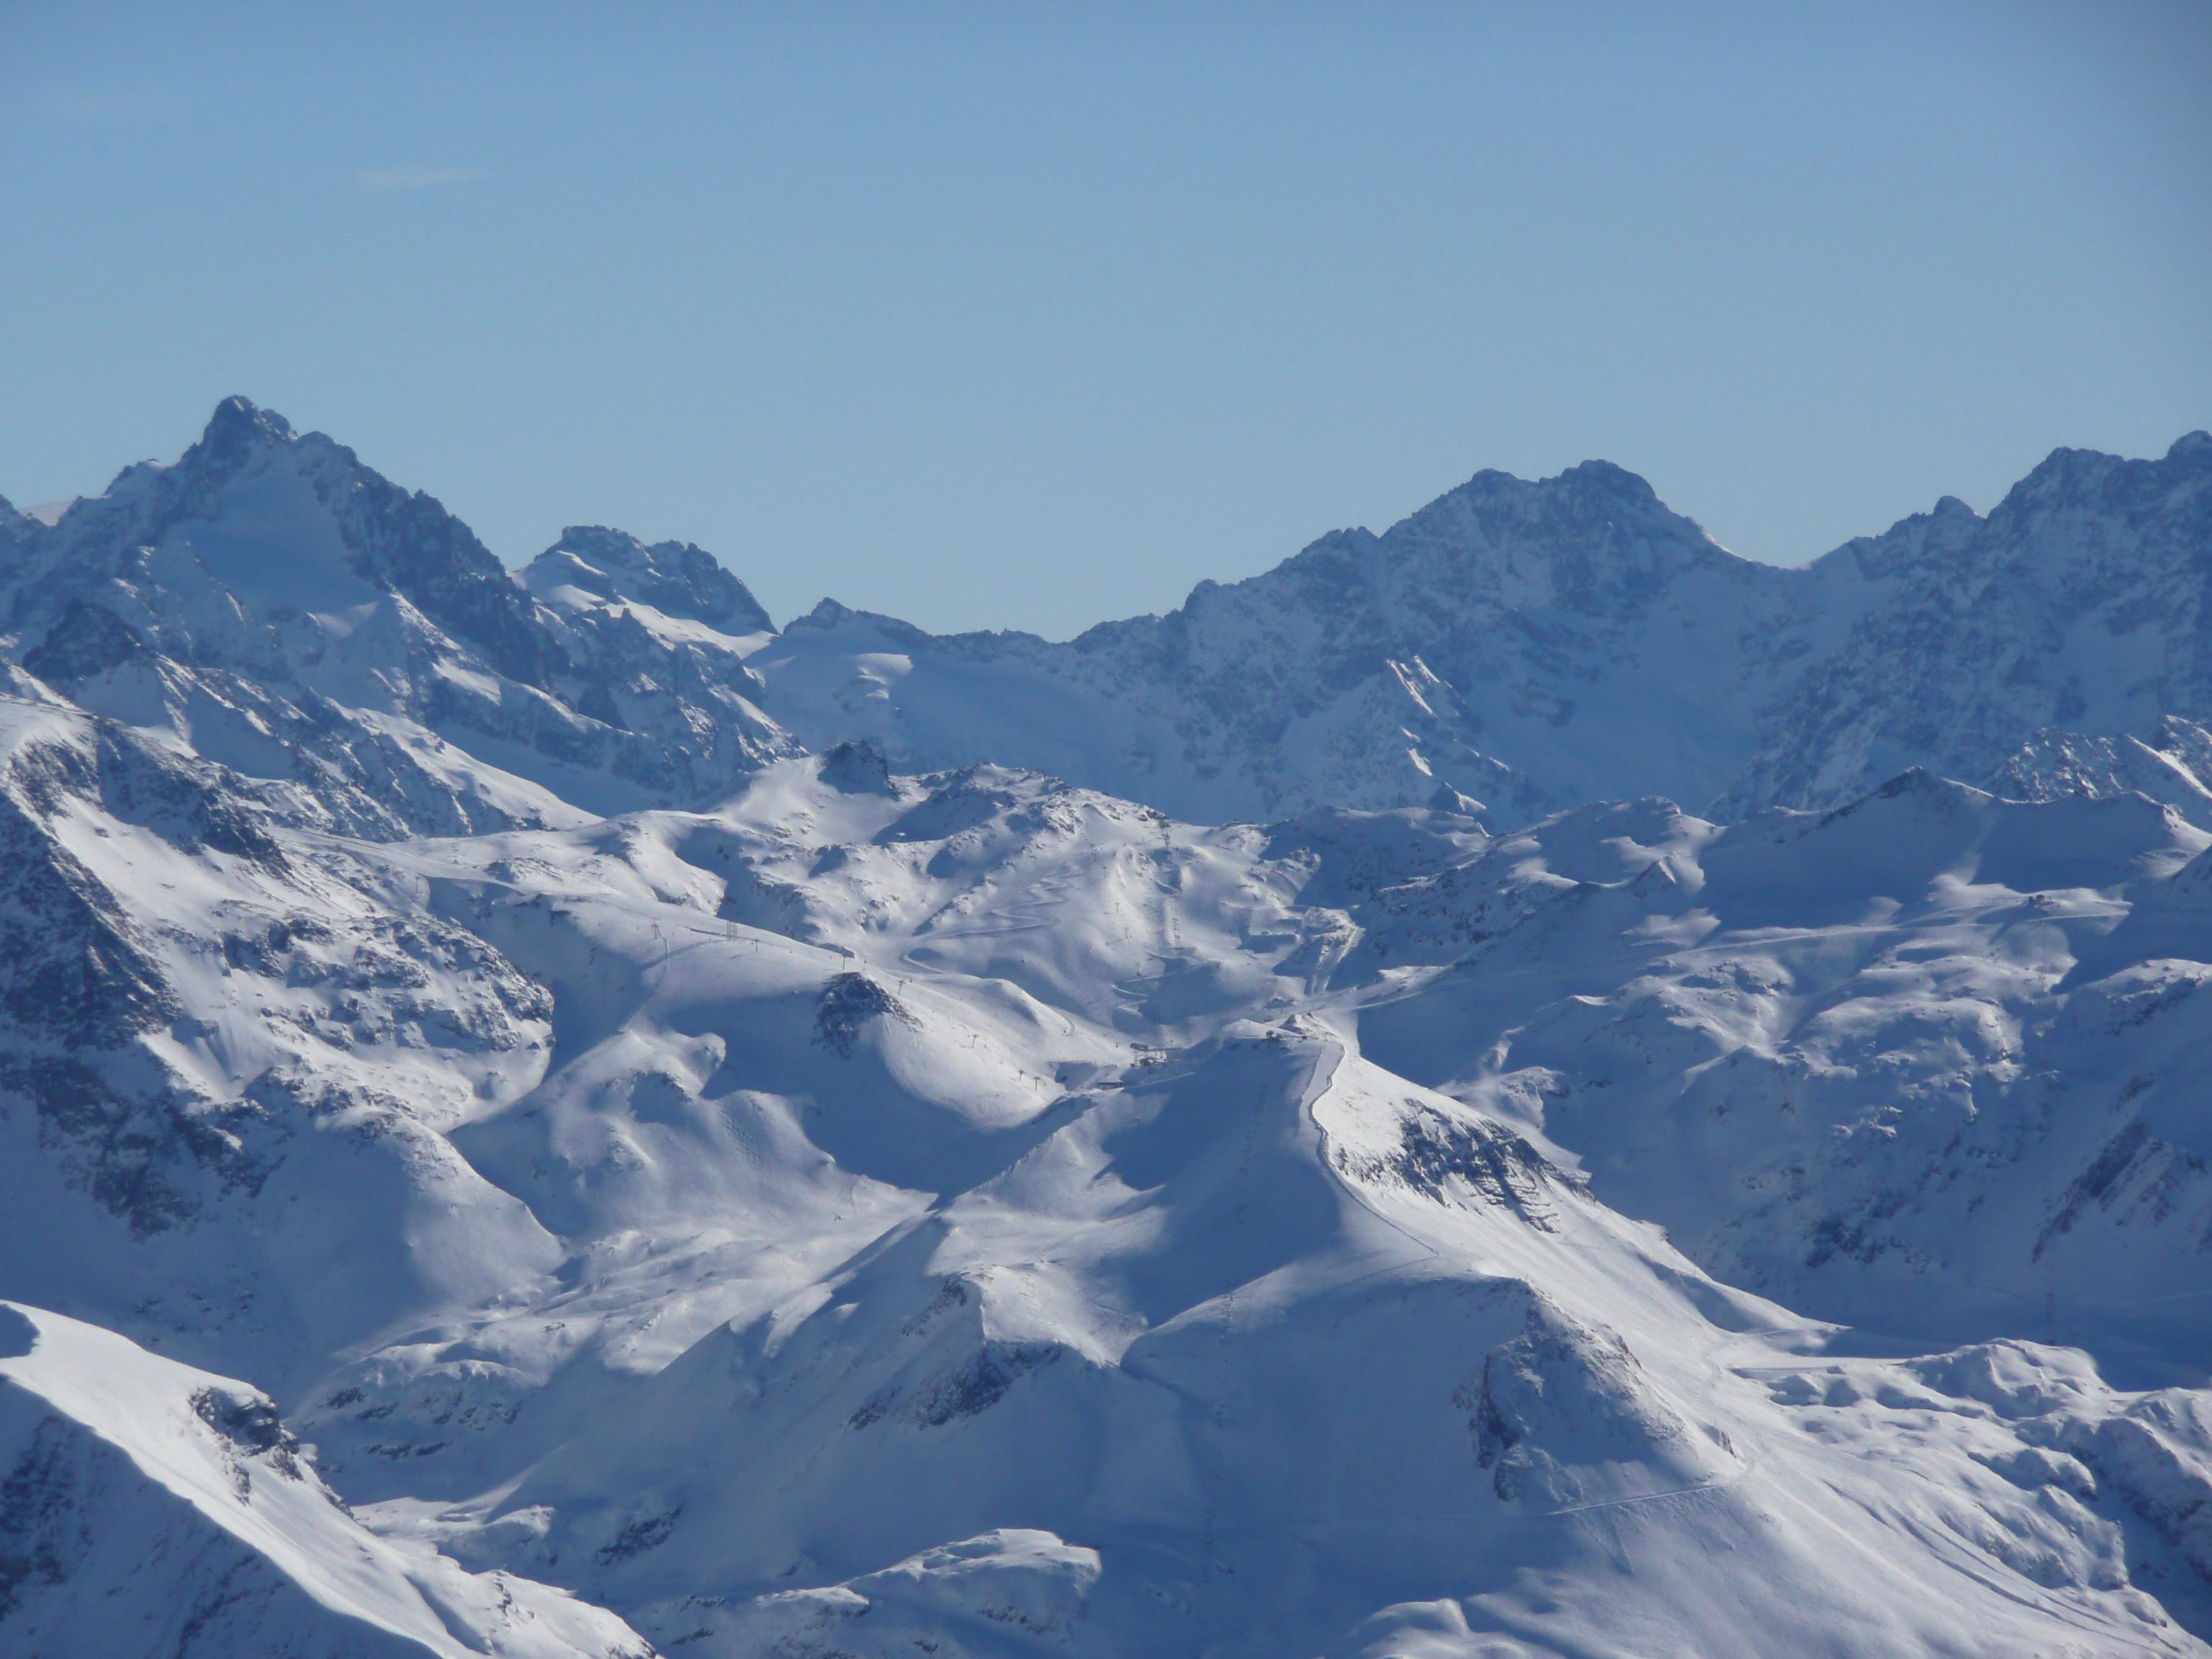 Fichier:Montagne 001.JPG — Wikipédia